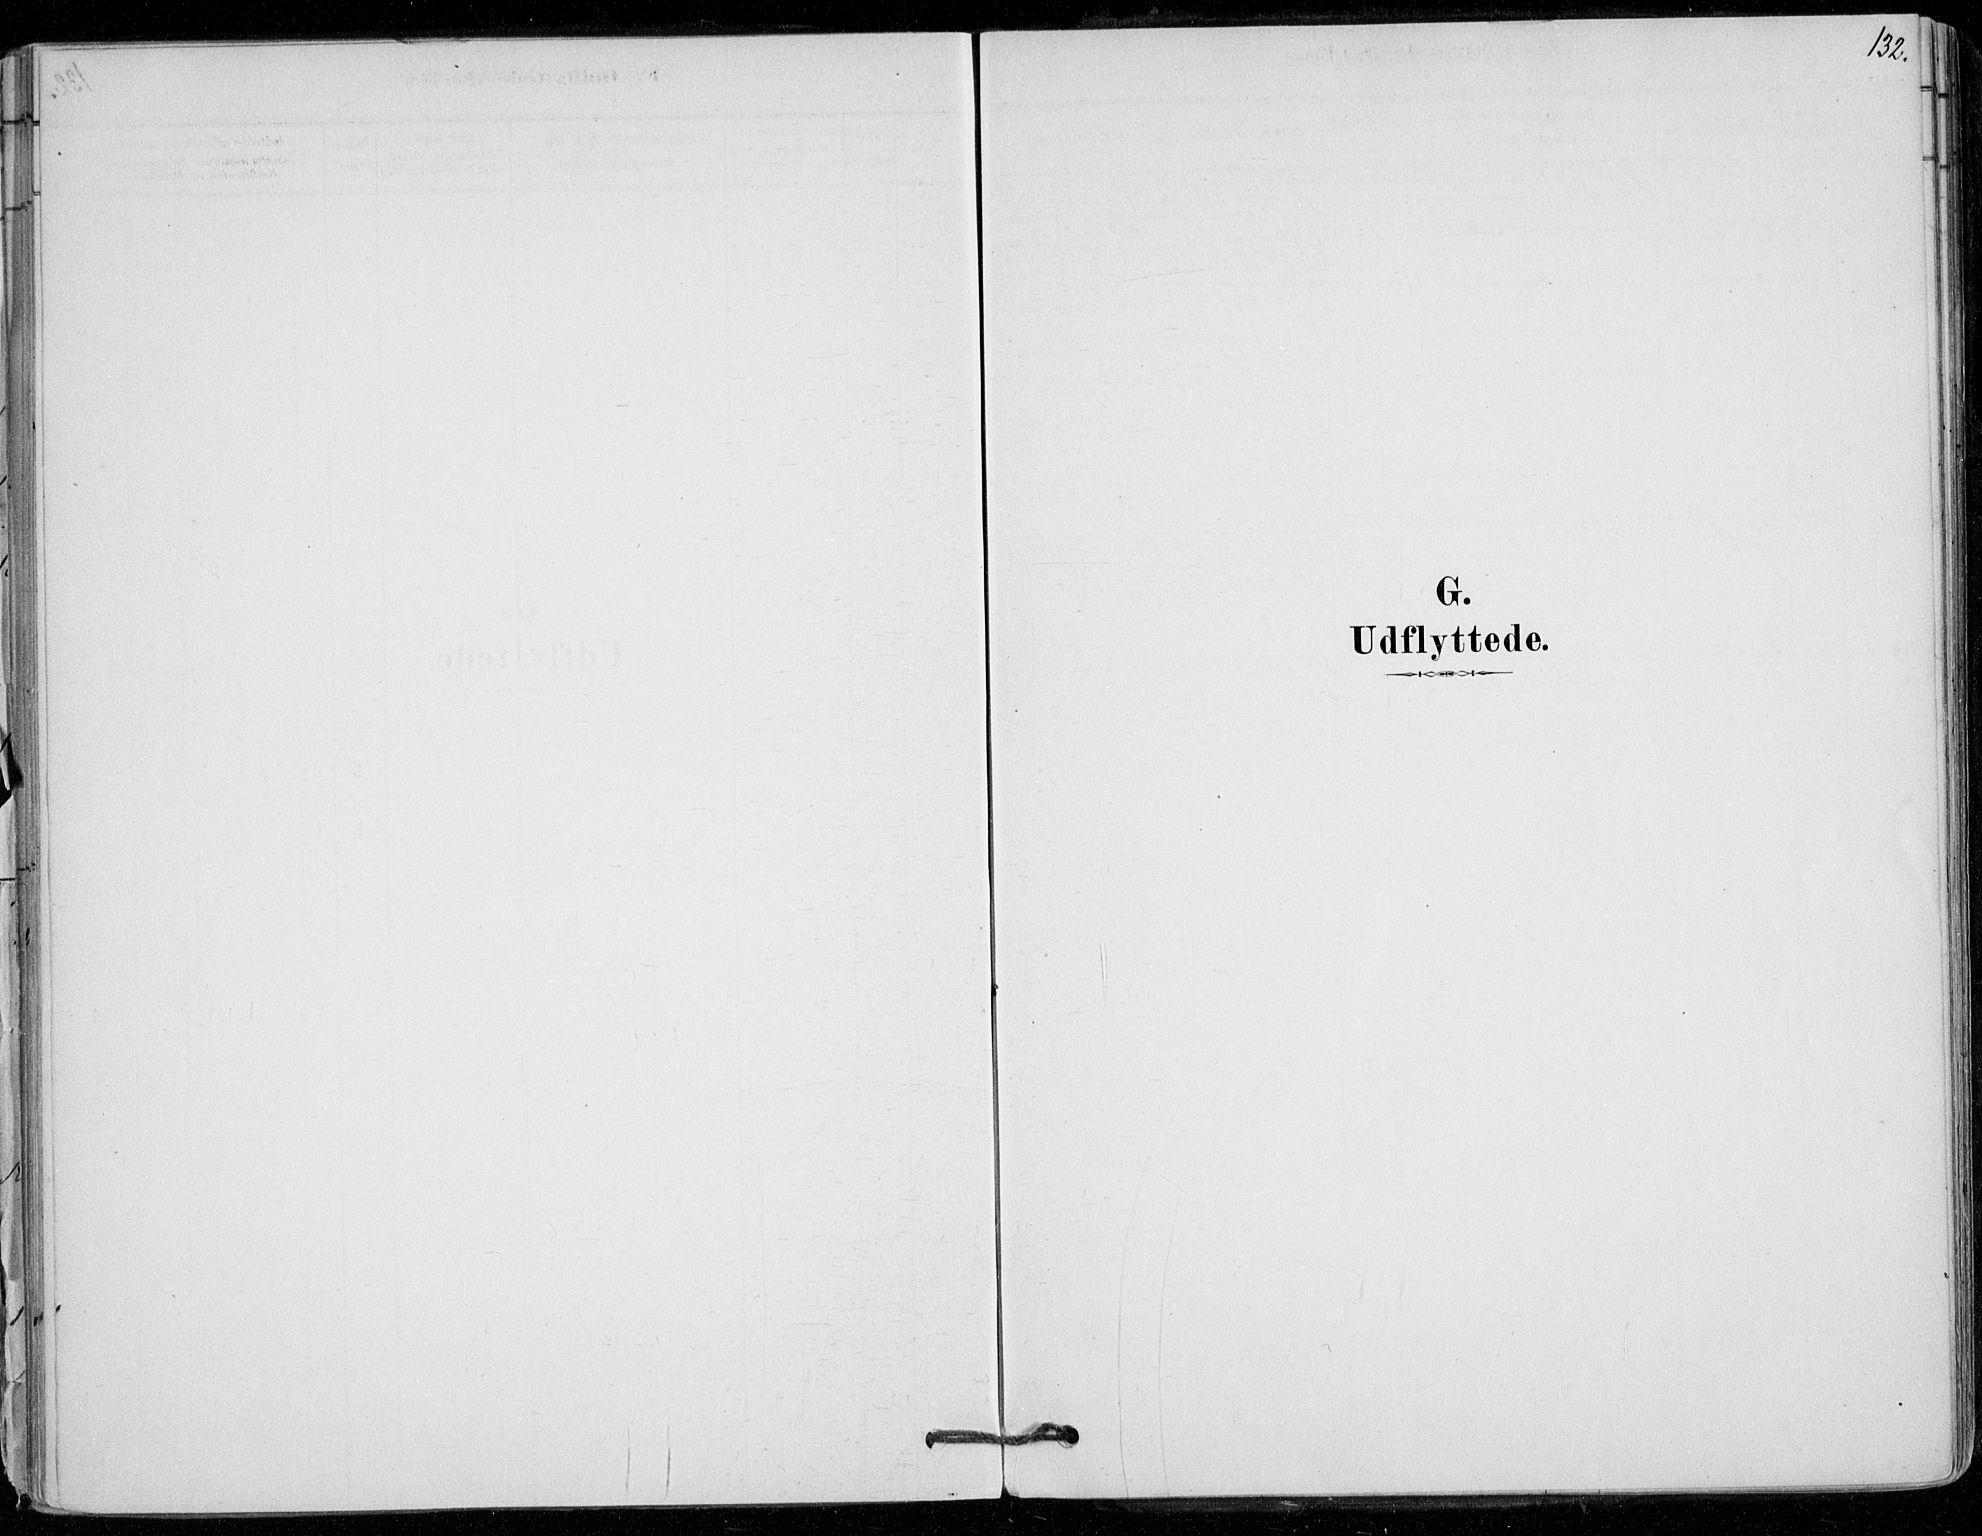 SAO, Vestby prestekontor Kirkebøker, F/Fd/L0001: Ministerialbok nr. IV 1, 1878-1945, s. 132